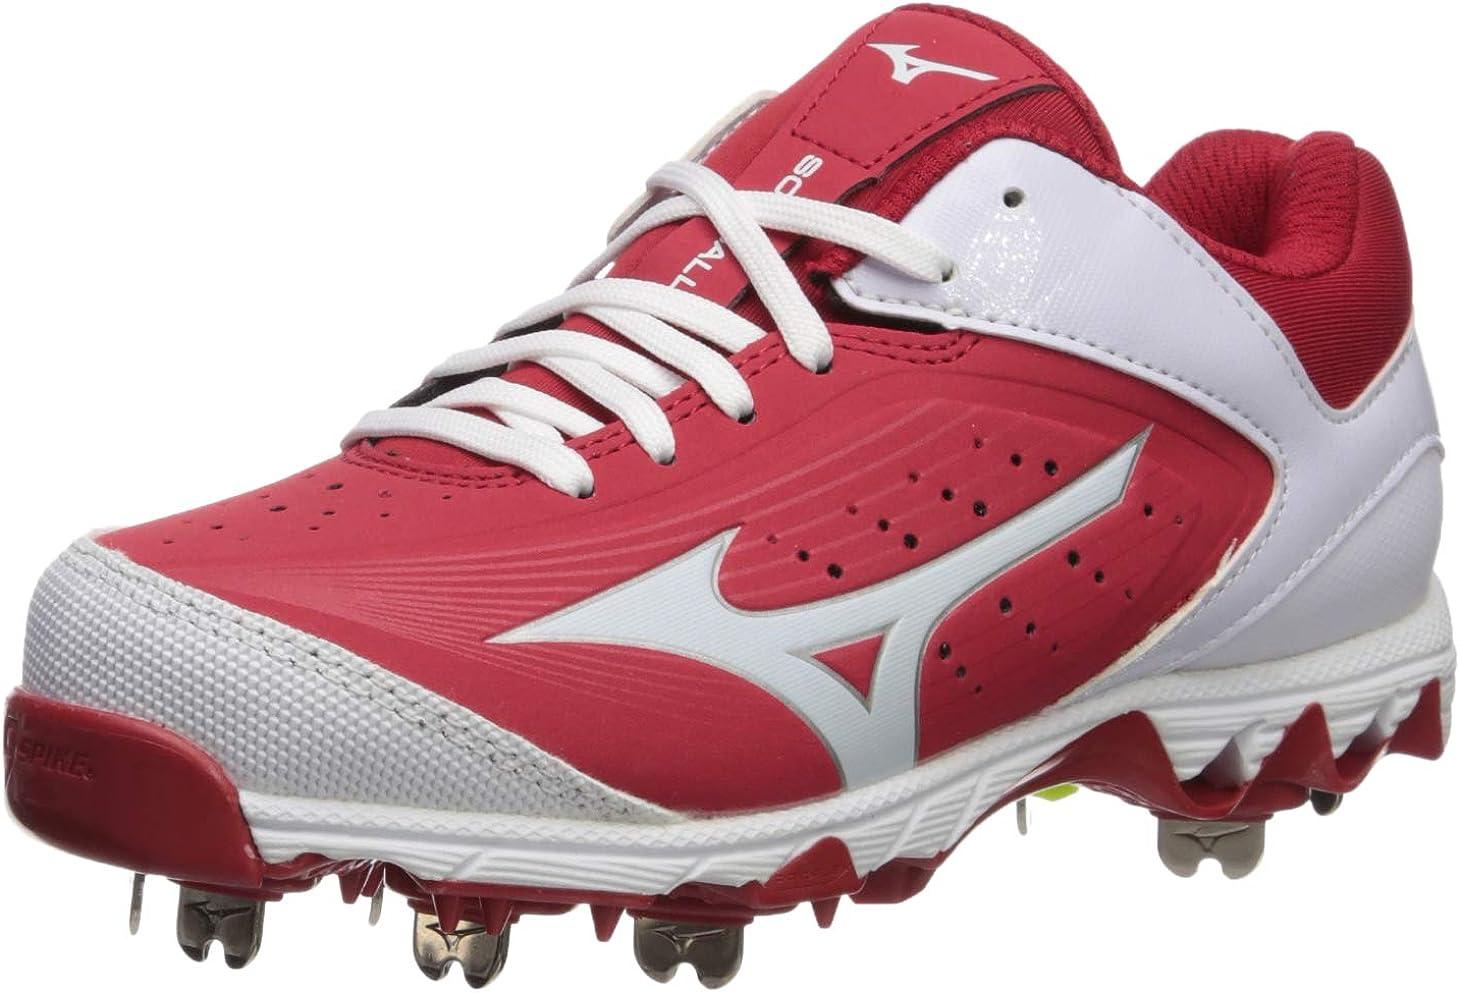 Mizuno Women's Swift 5 Softball Shoe Cleat Max 40% OFF 40% OFF Cheap Sale Fastpitch